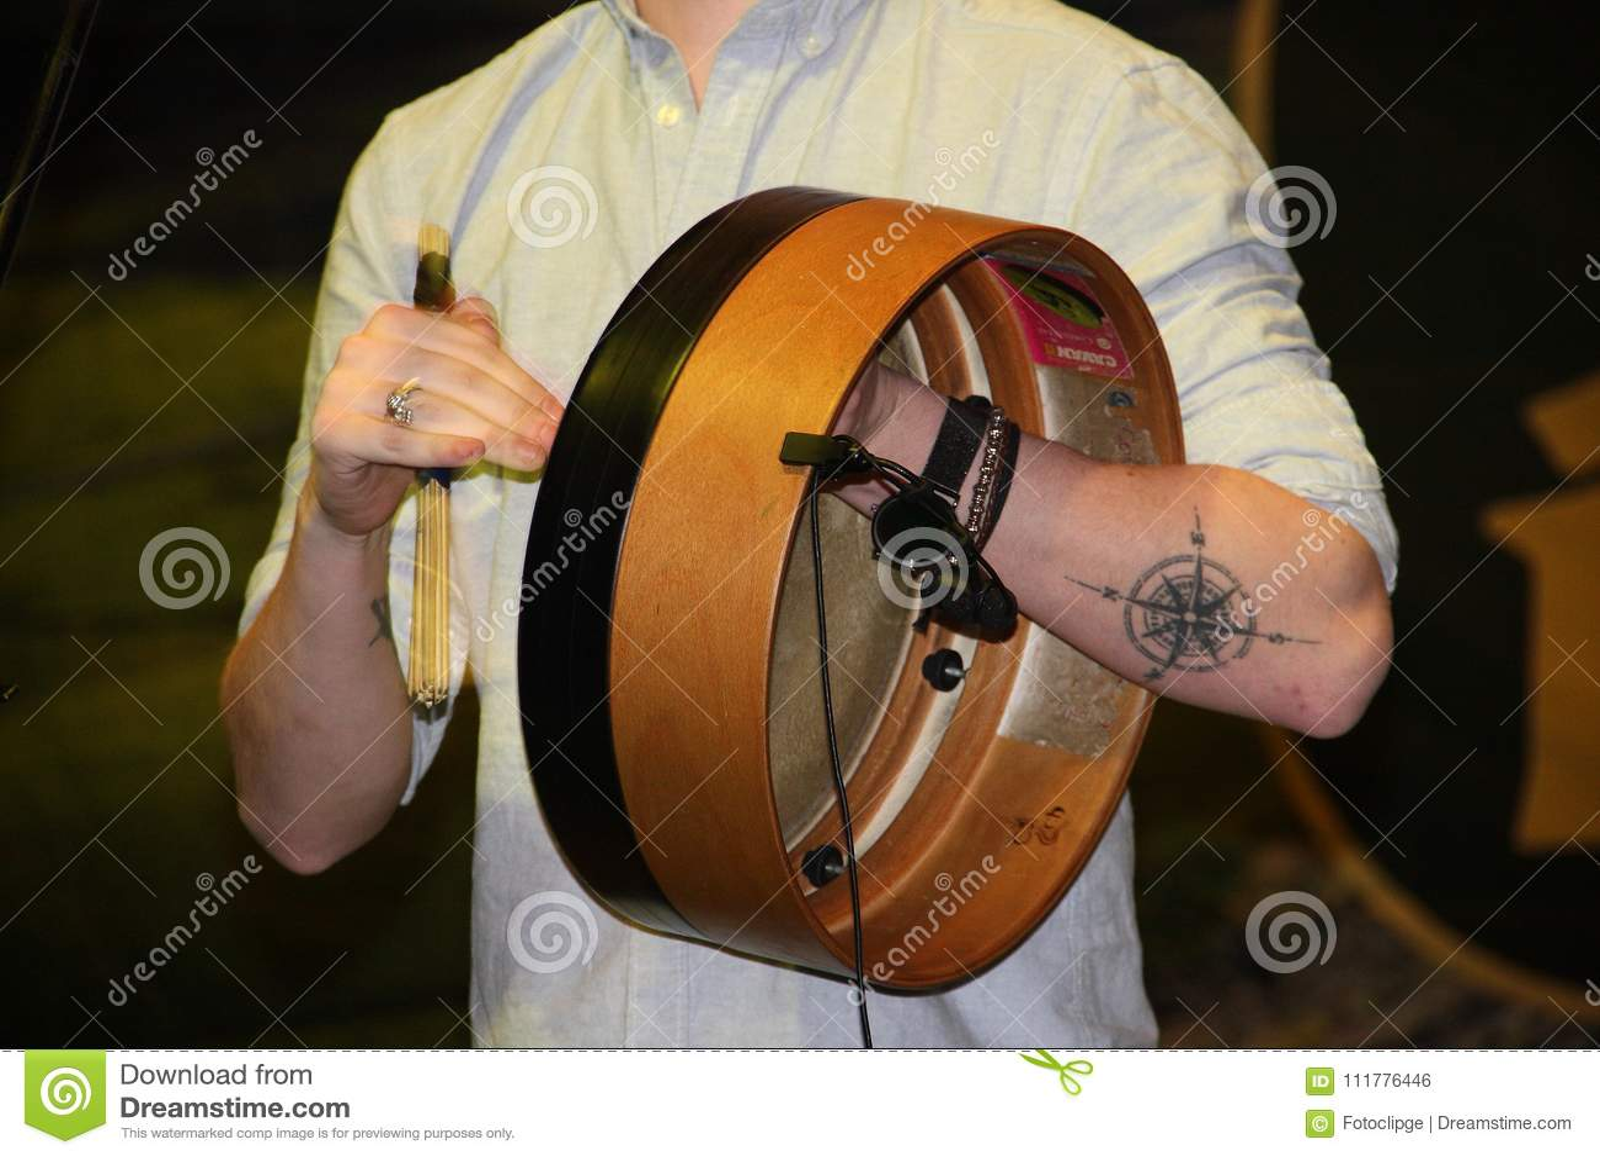 Bodharan player of the Kilkennys group